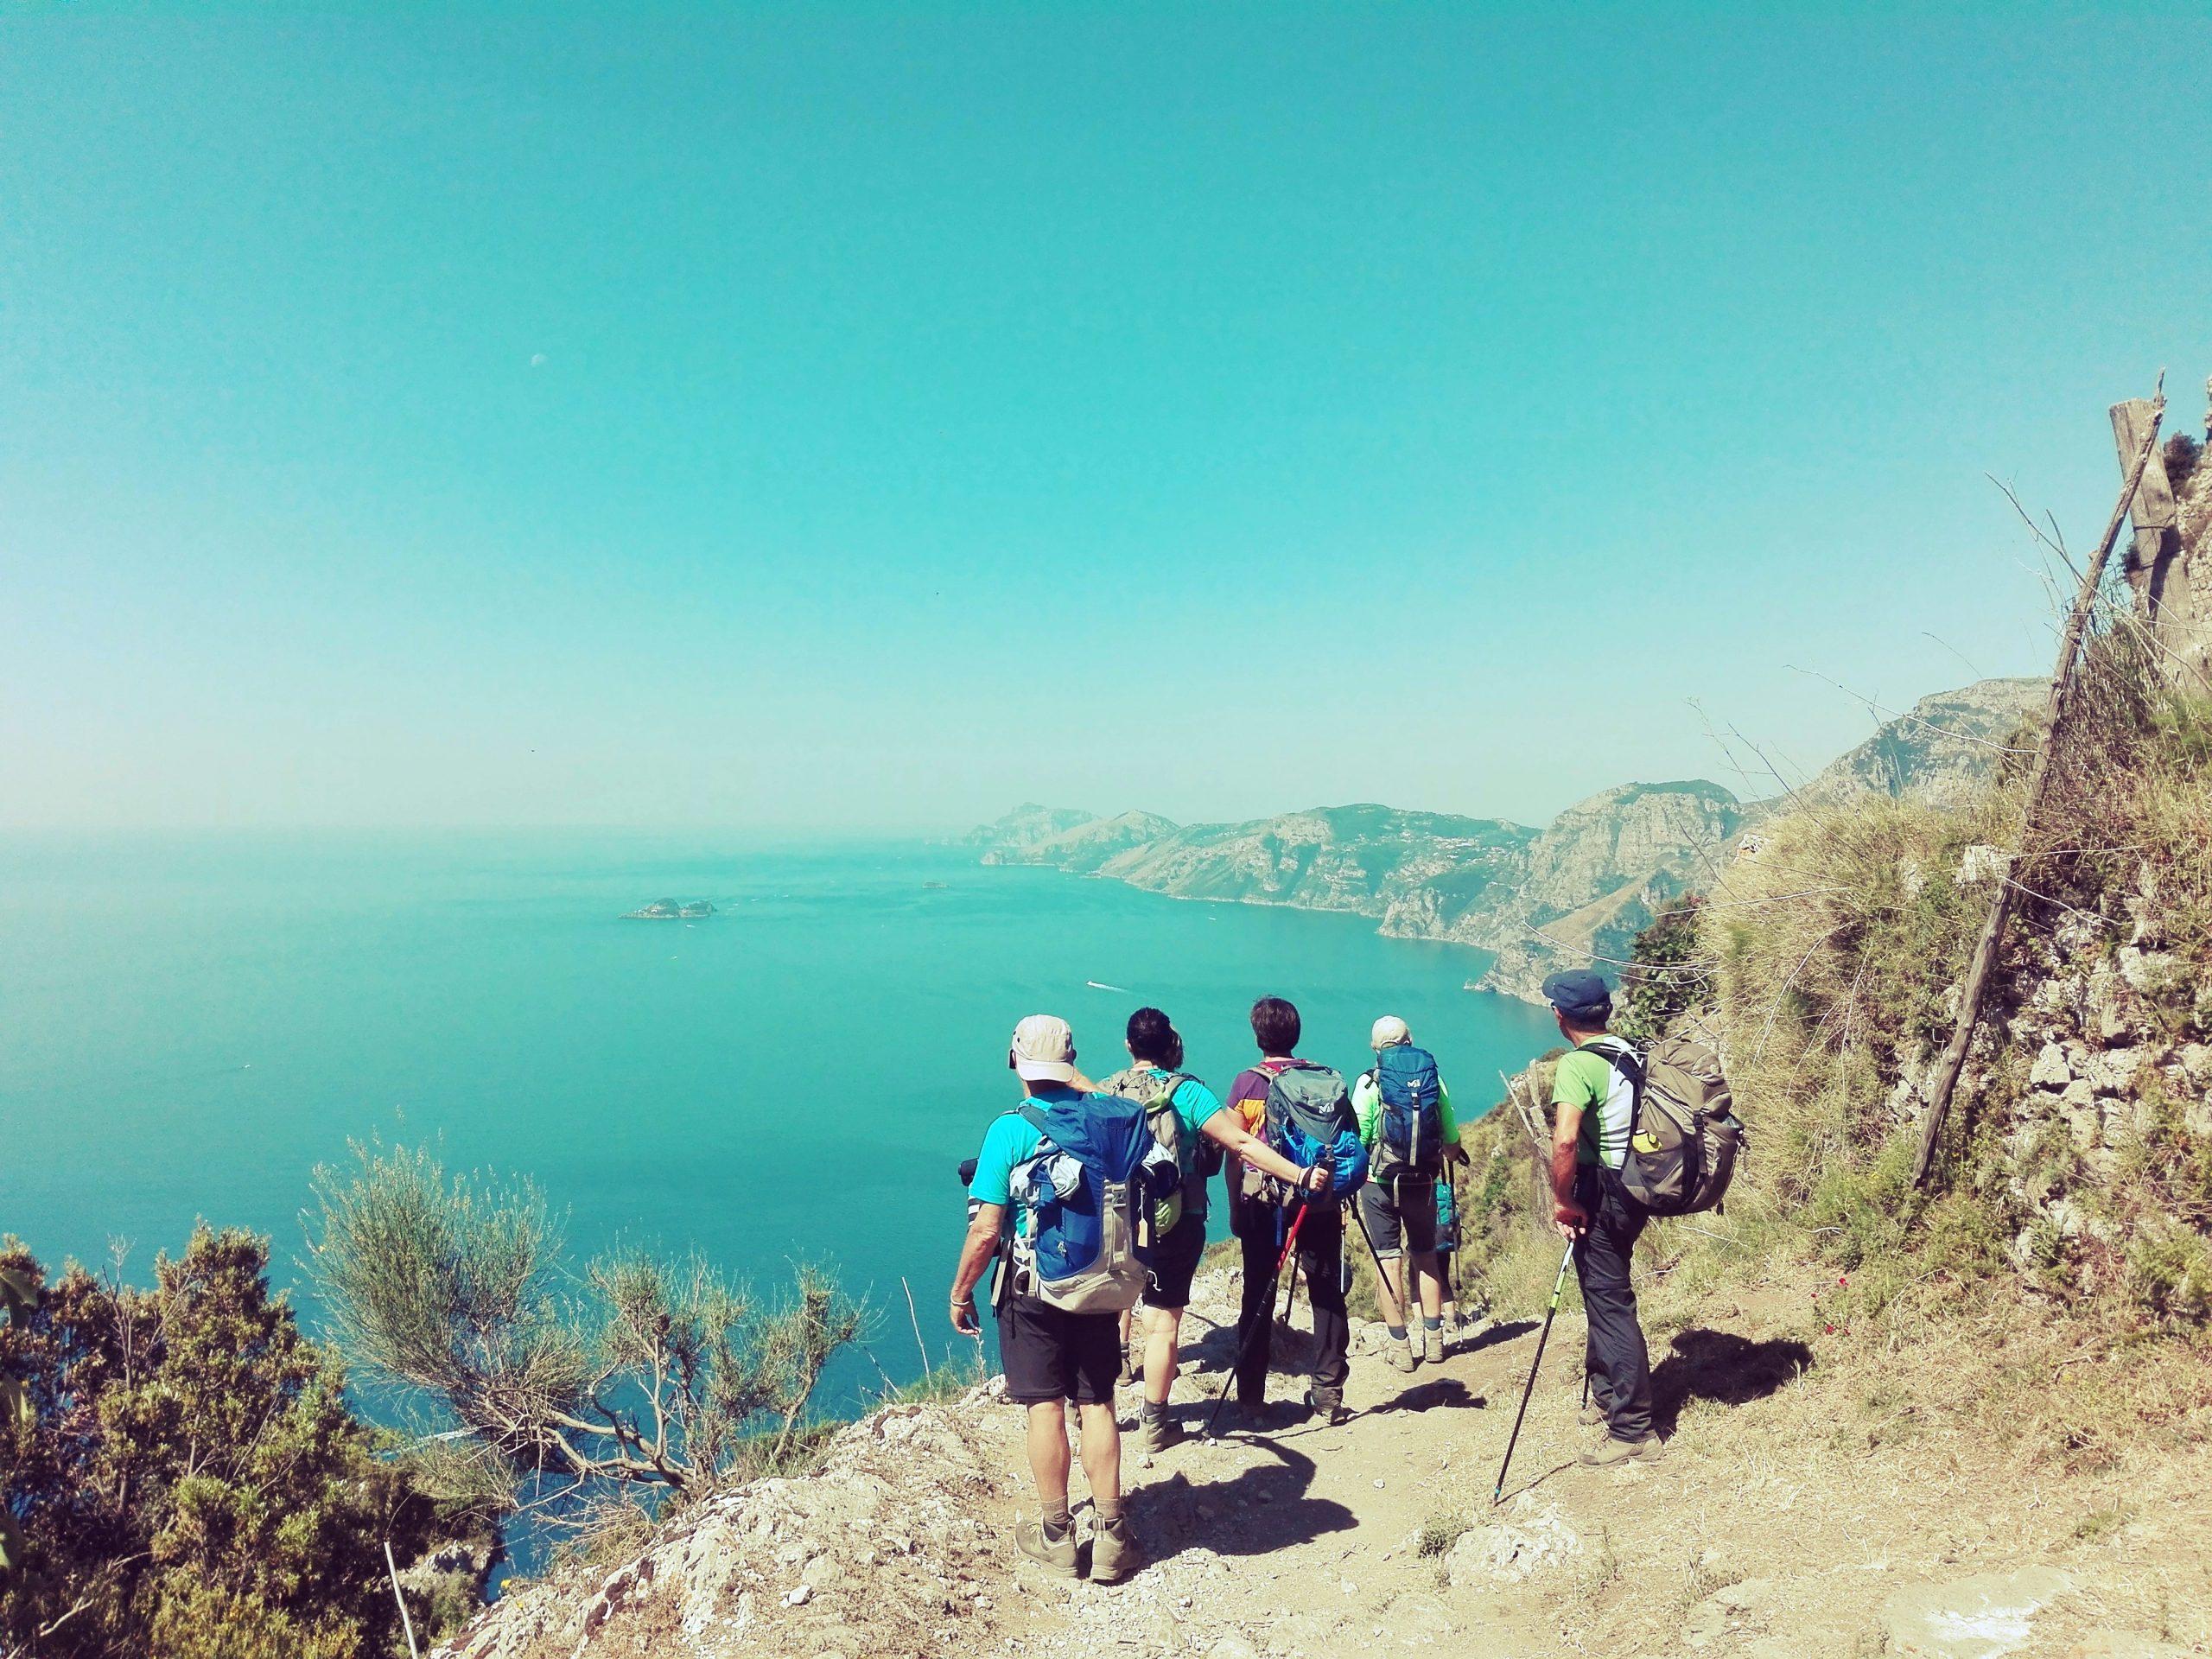 vista-costa-amalfitana-durante-il-trekking